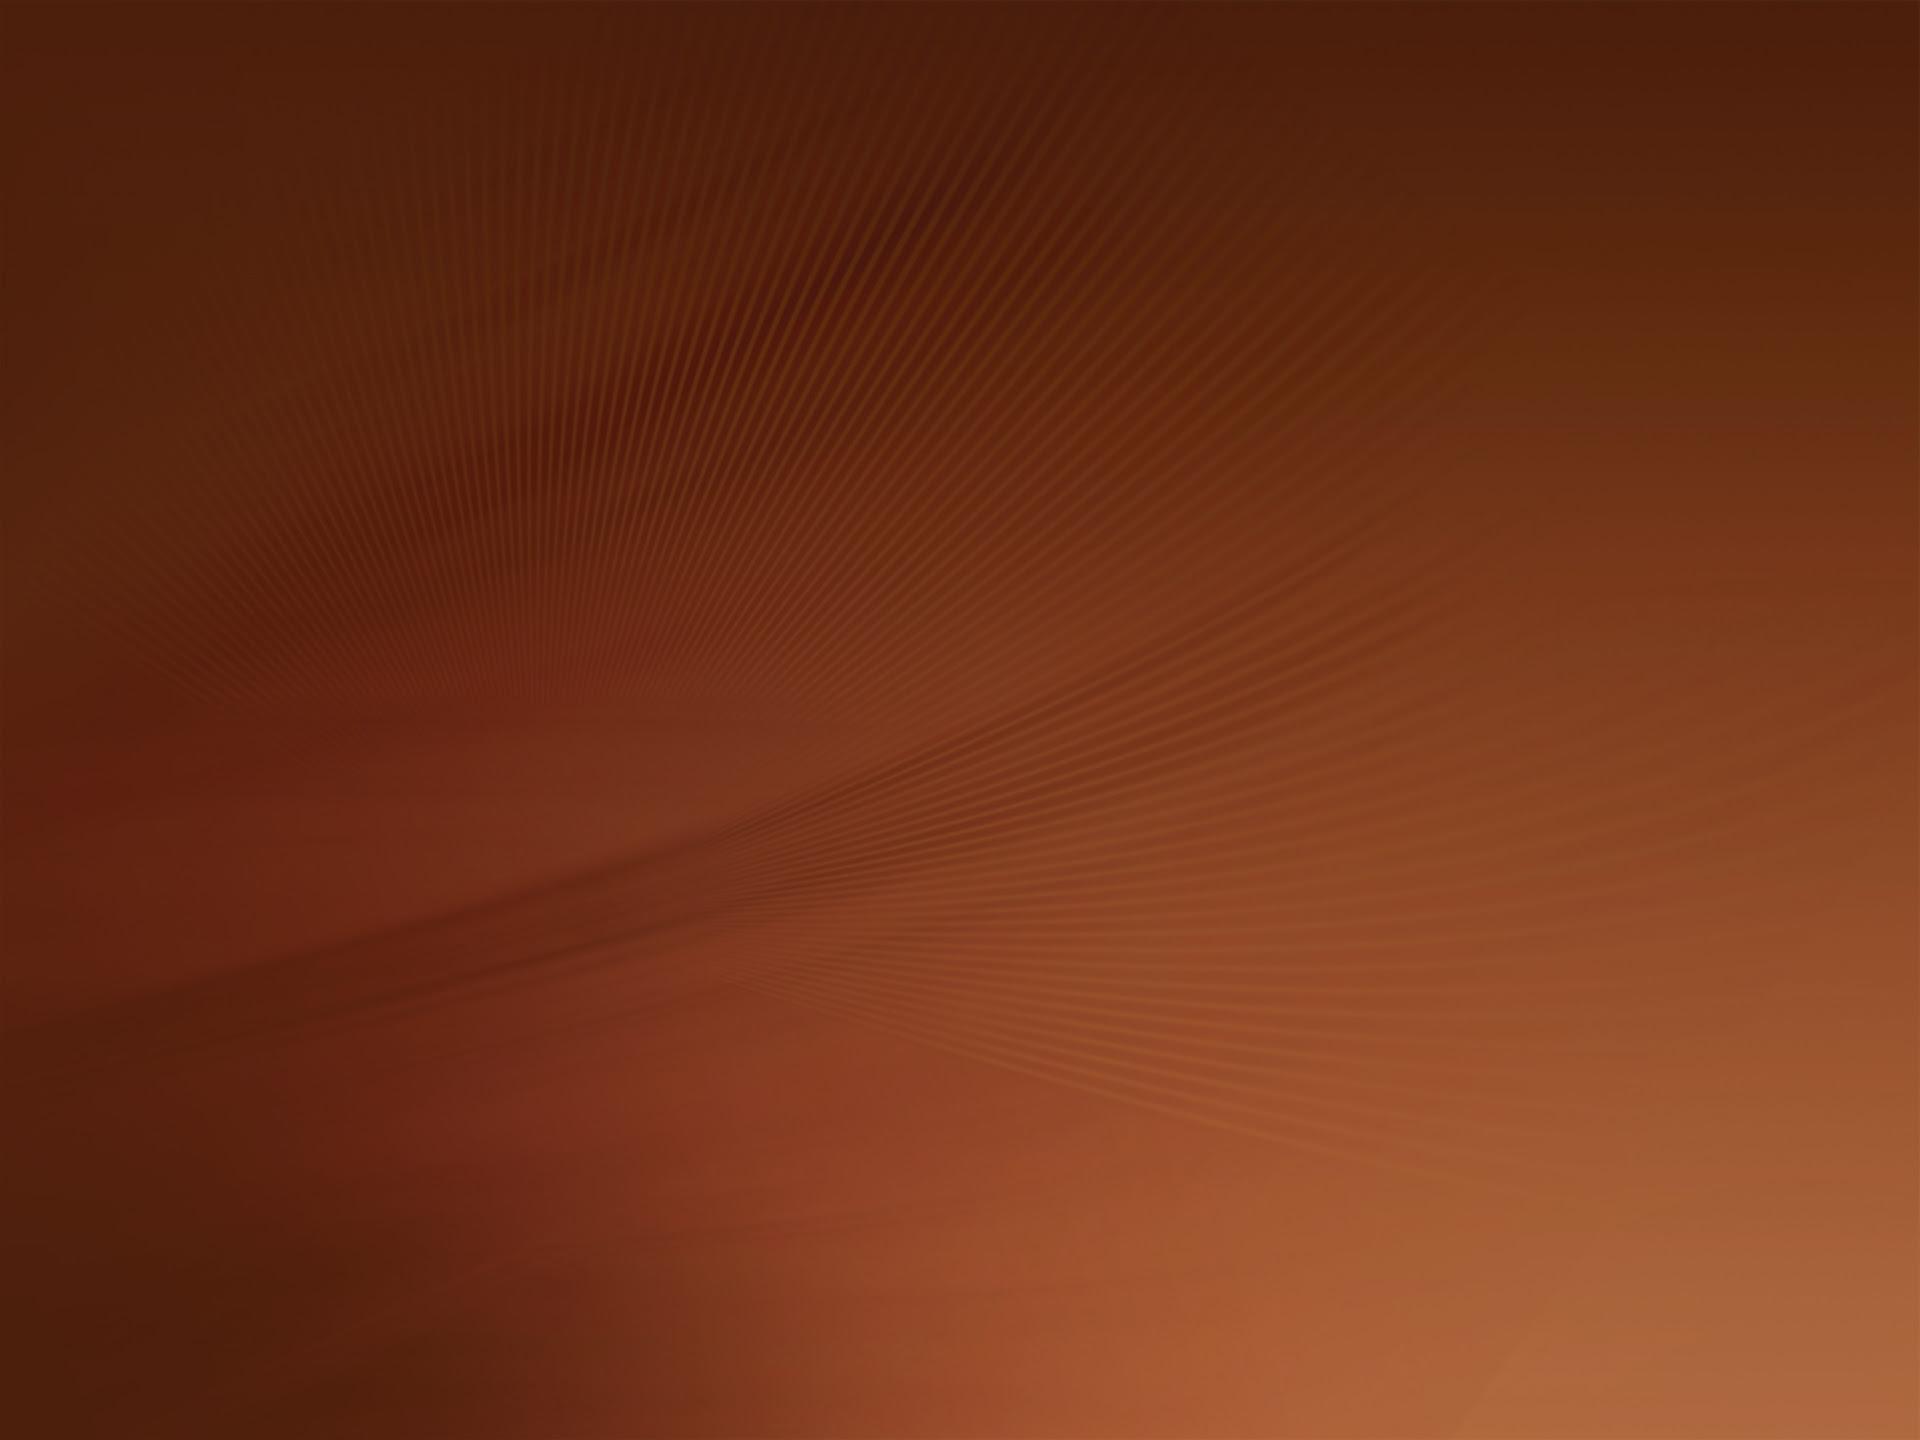 ubuntu,ubuntu 9.04,jaunty jackalope,wallpapers,free wallpapers